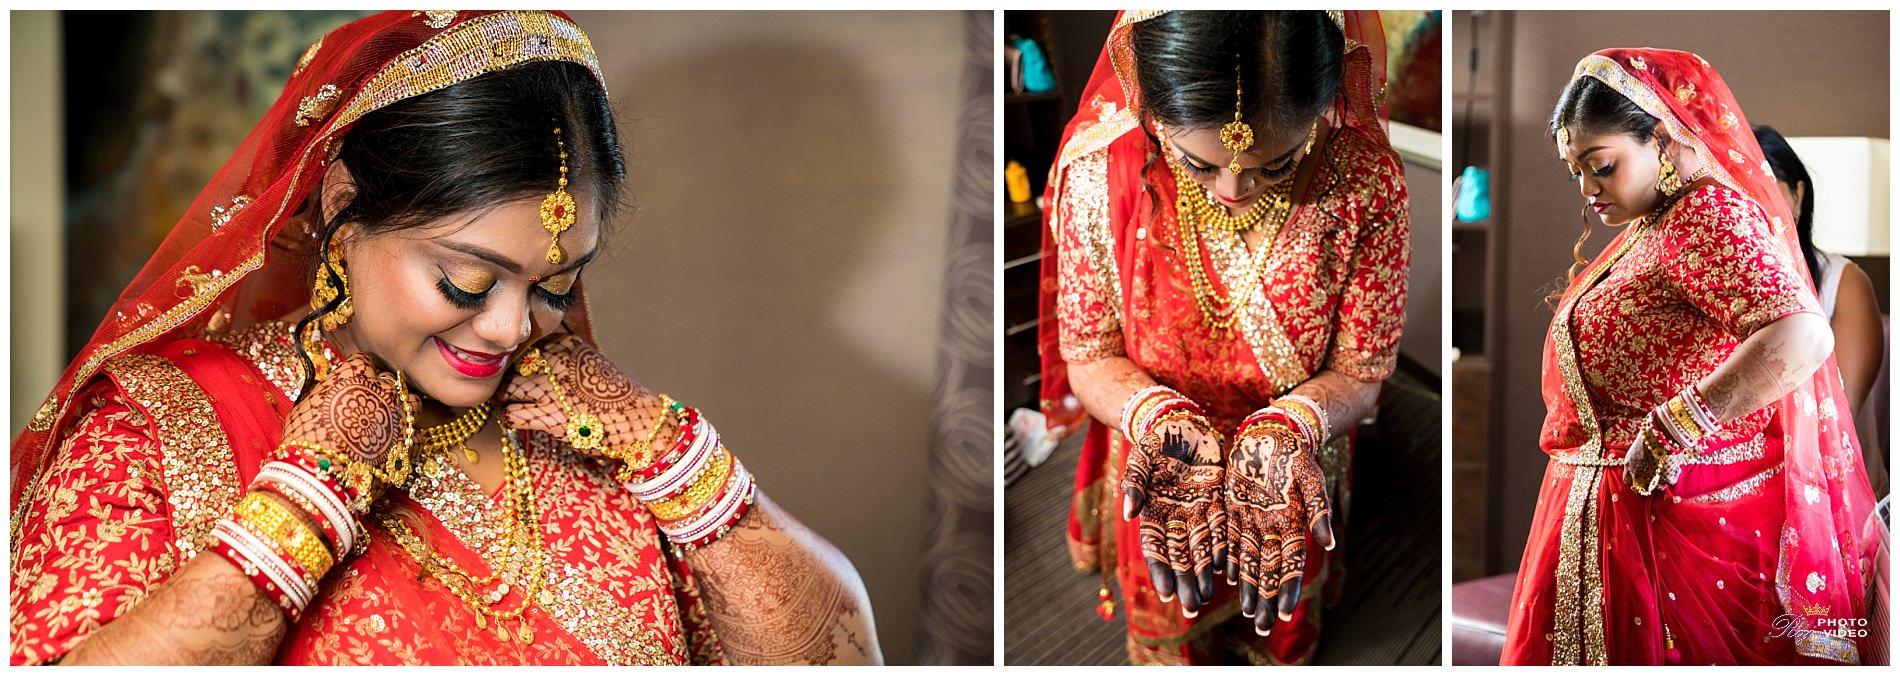 doubletree-by-hilton-hotel-wilmington-de-wedding-krishna-ritesh-27.jpg